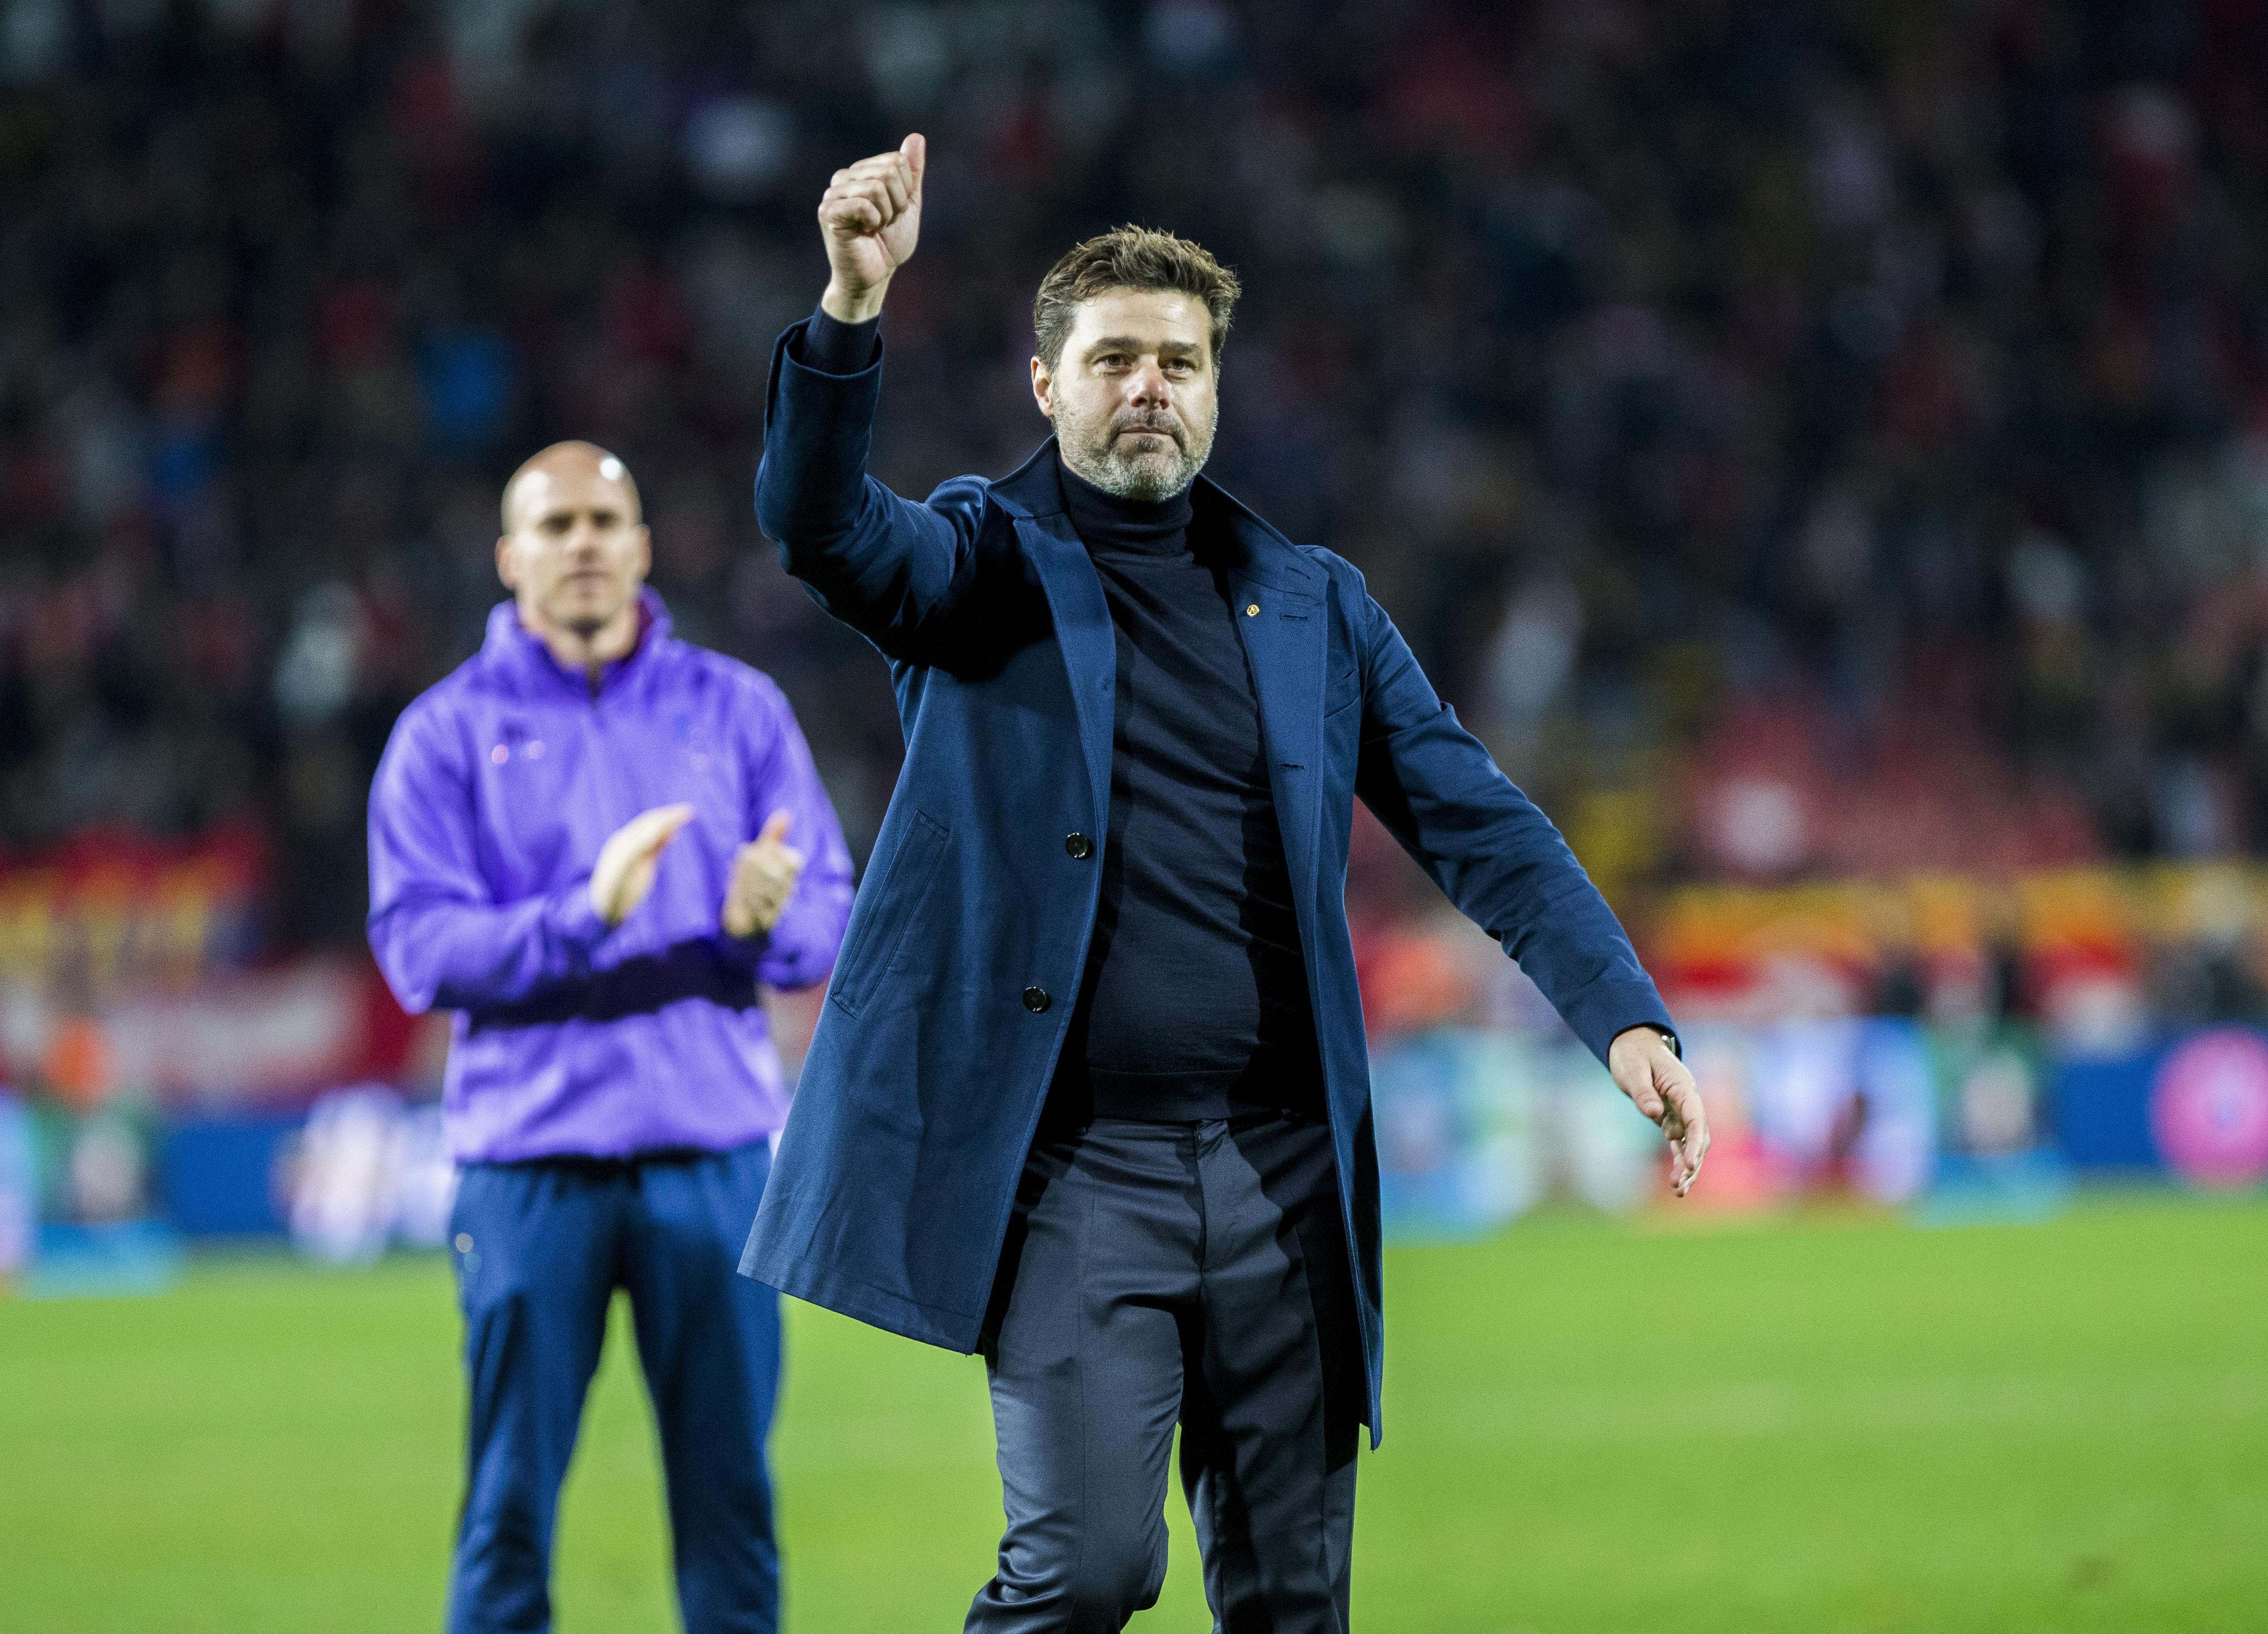 Football - Transferts - Le journal du mercato : Pochettino et Heinze sondés pour remplacer Villas-Boas ?